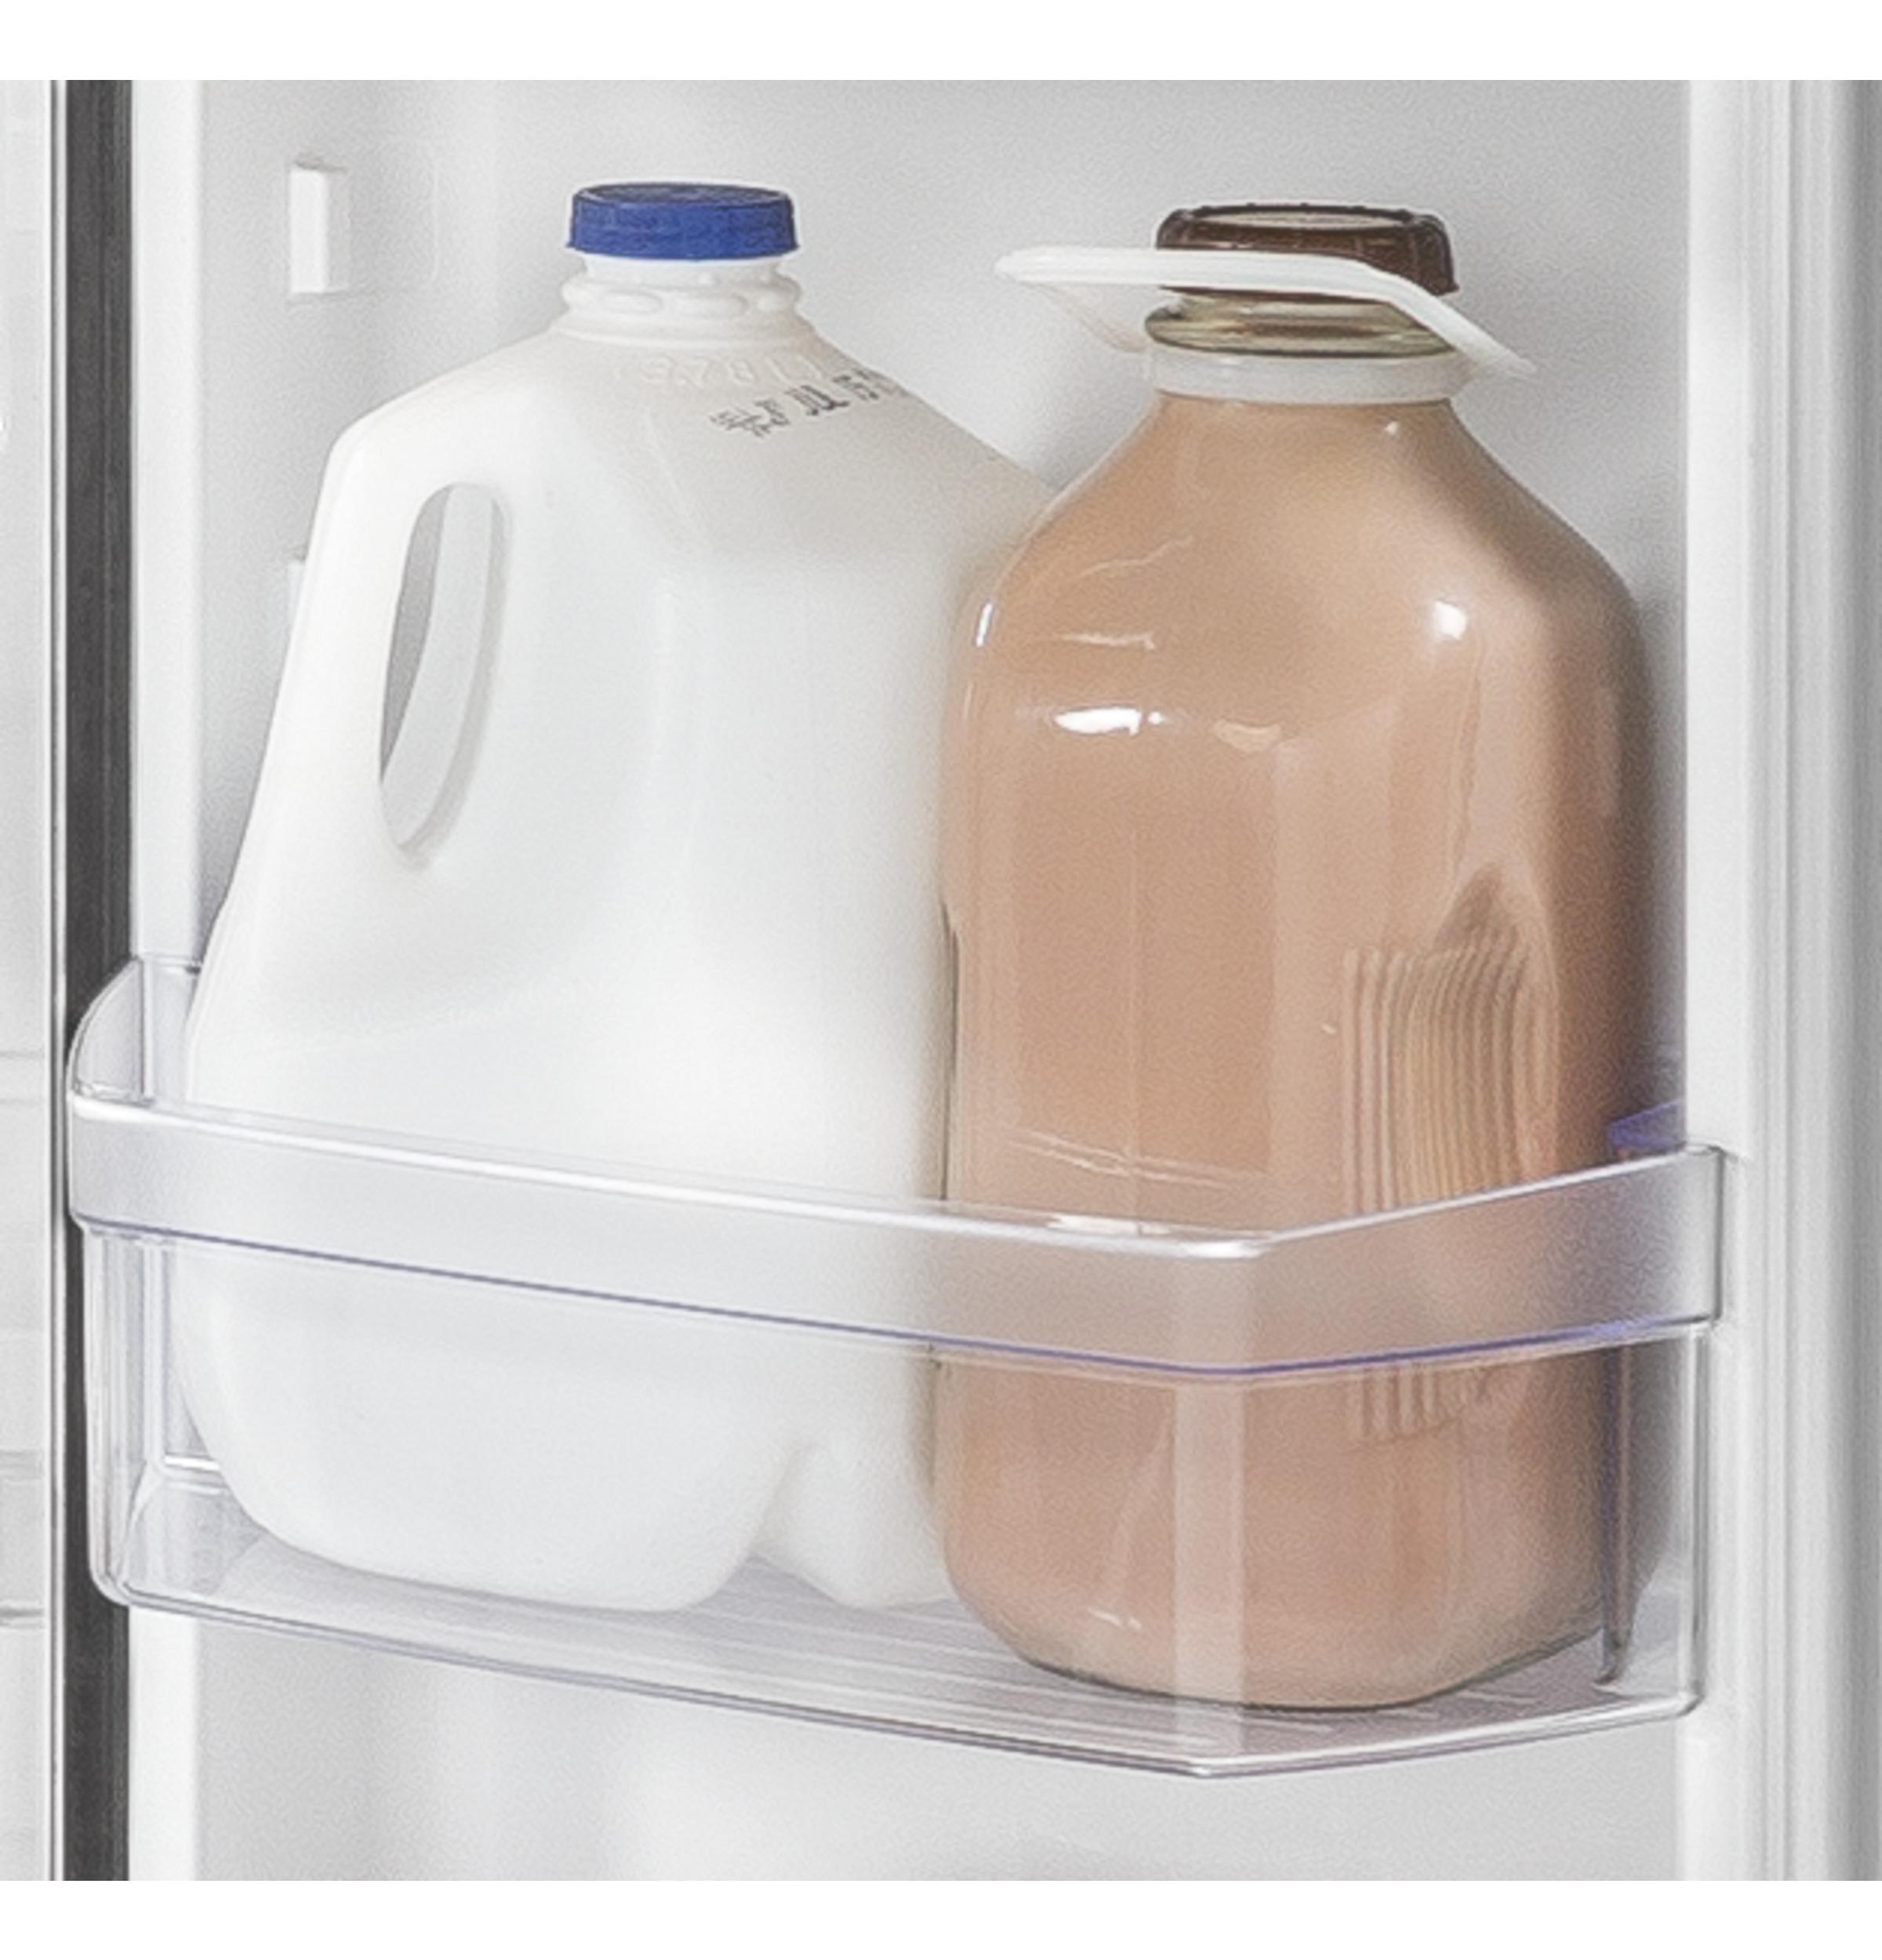 Model: GYE18JBLTS | GE GE® ENERGY STAR® 17.5 Cu. Ft. Counter-Depth French-Door Refrigerator